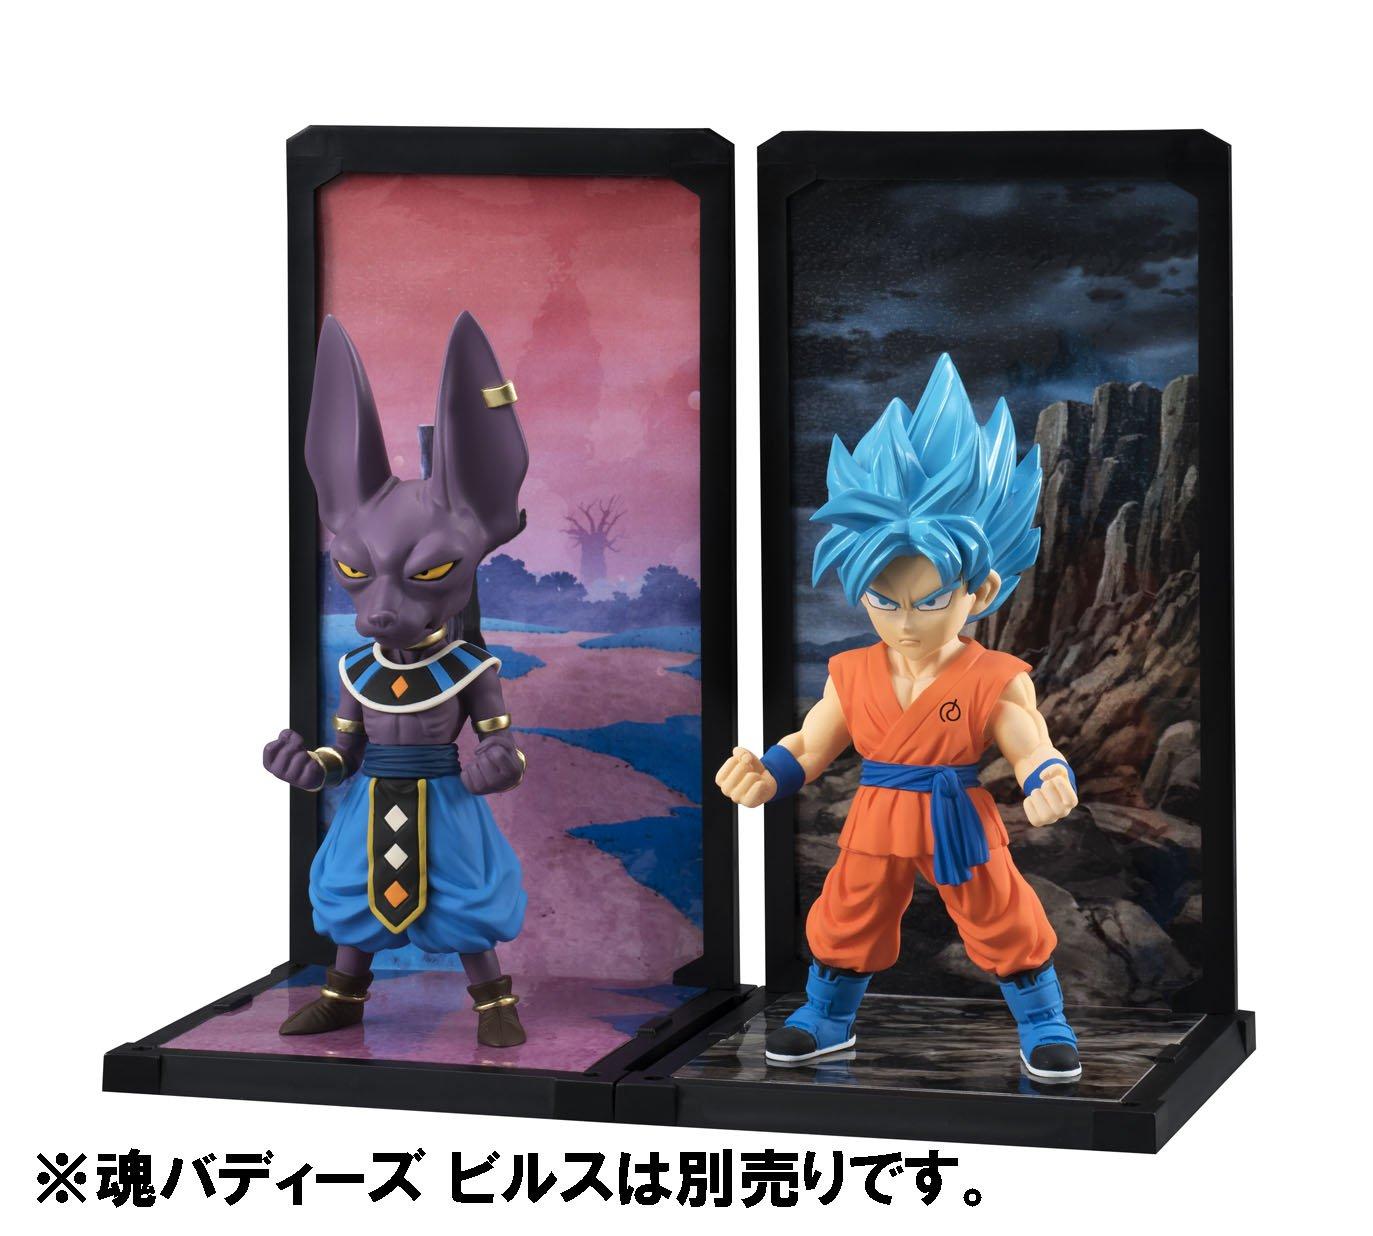 Tamashii Nations Bandai Tamashii Buddies Super Saiyan God Super Saiyan Goku Dragon Ball Super Statue Bluefin Distribution Toys BAN06237